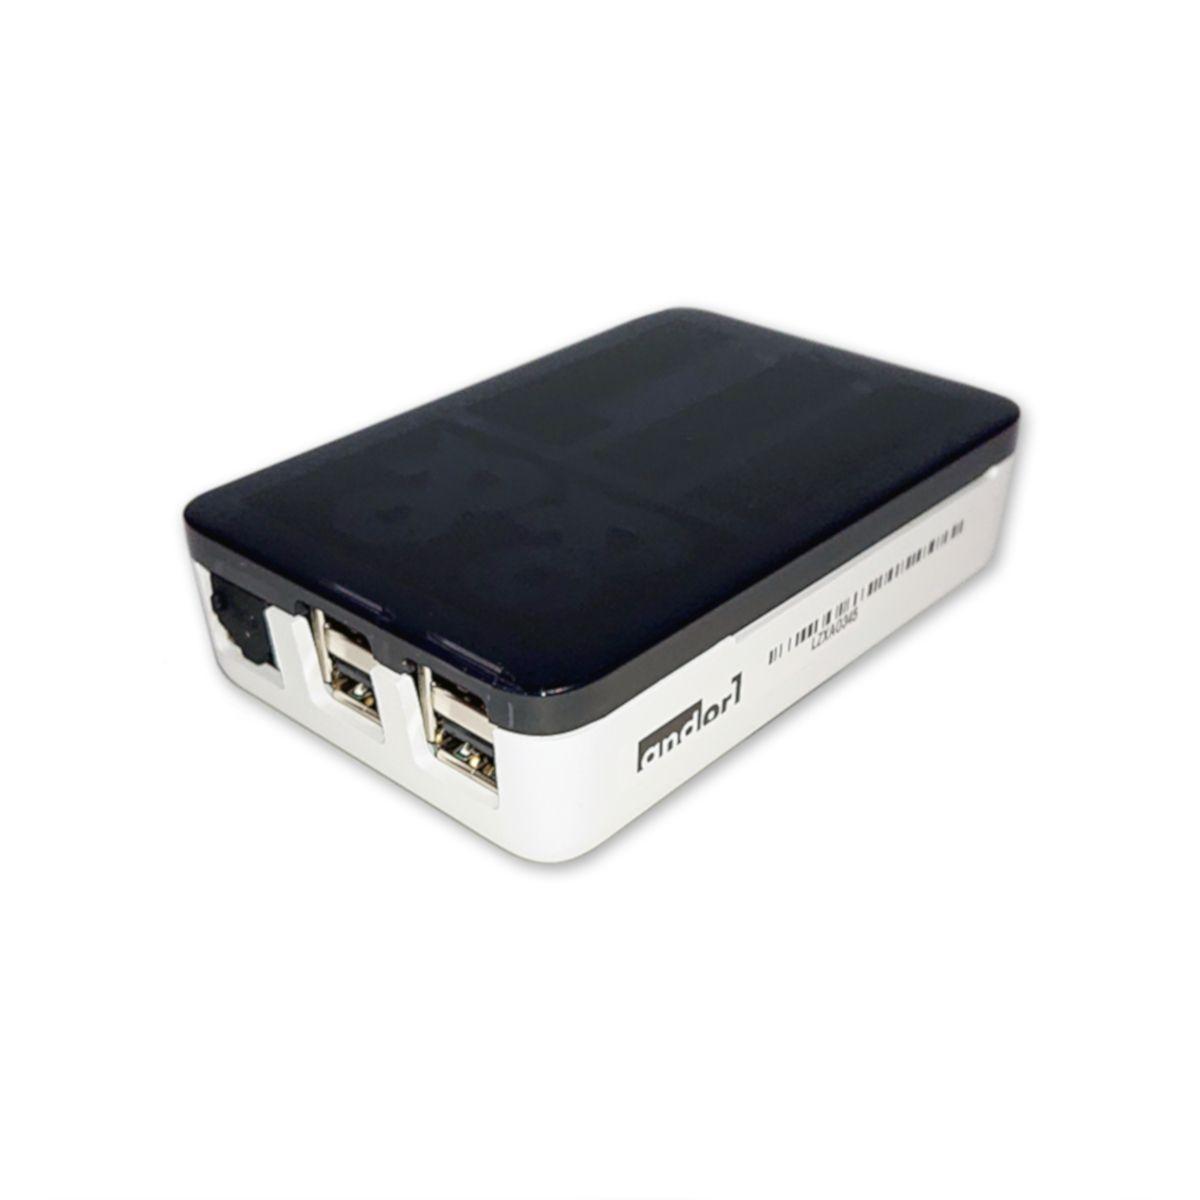 LZX Industries Andor 1 Looping Media Player (Deluxe - Black)